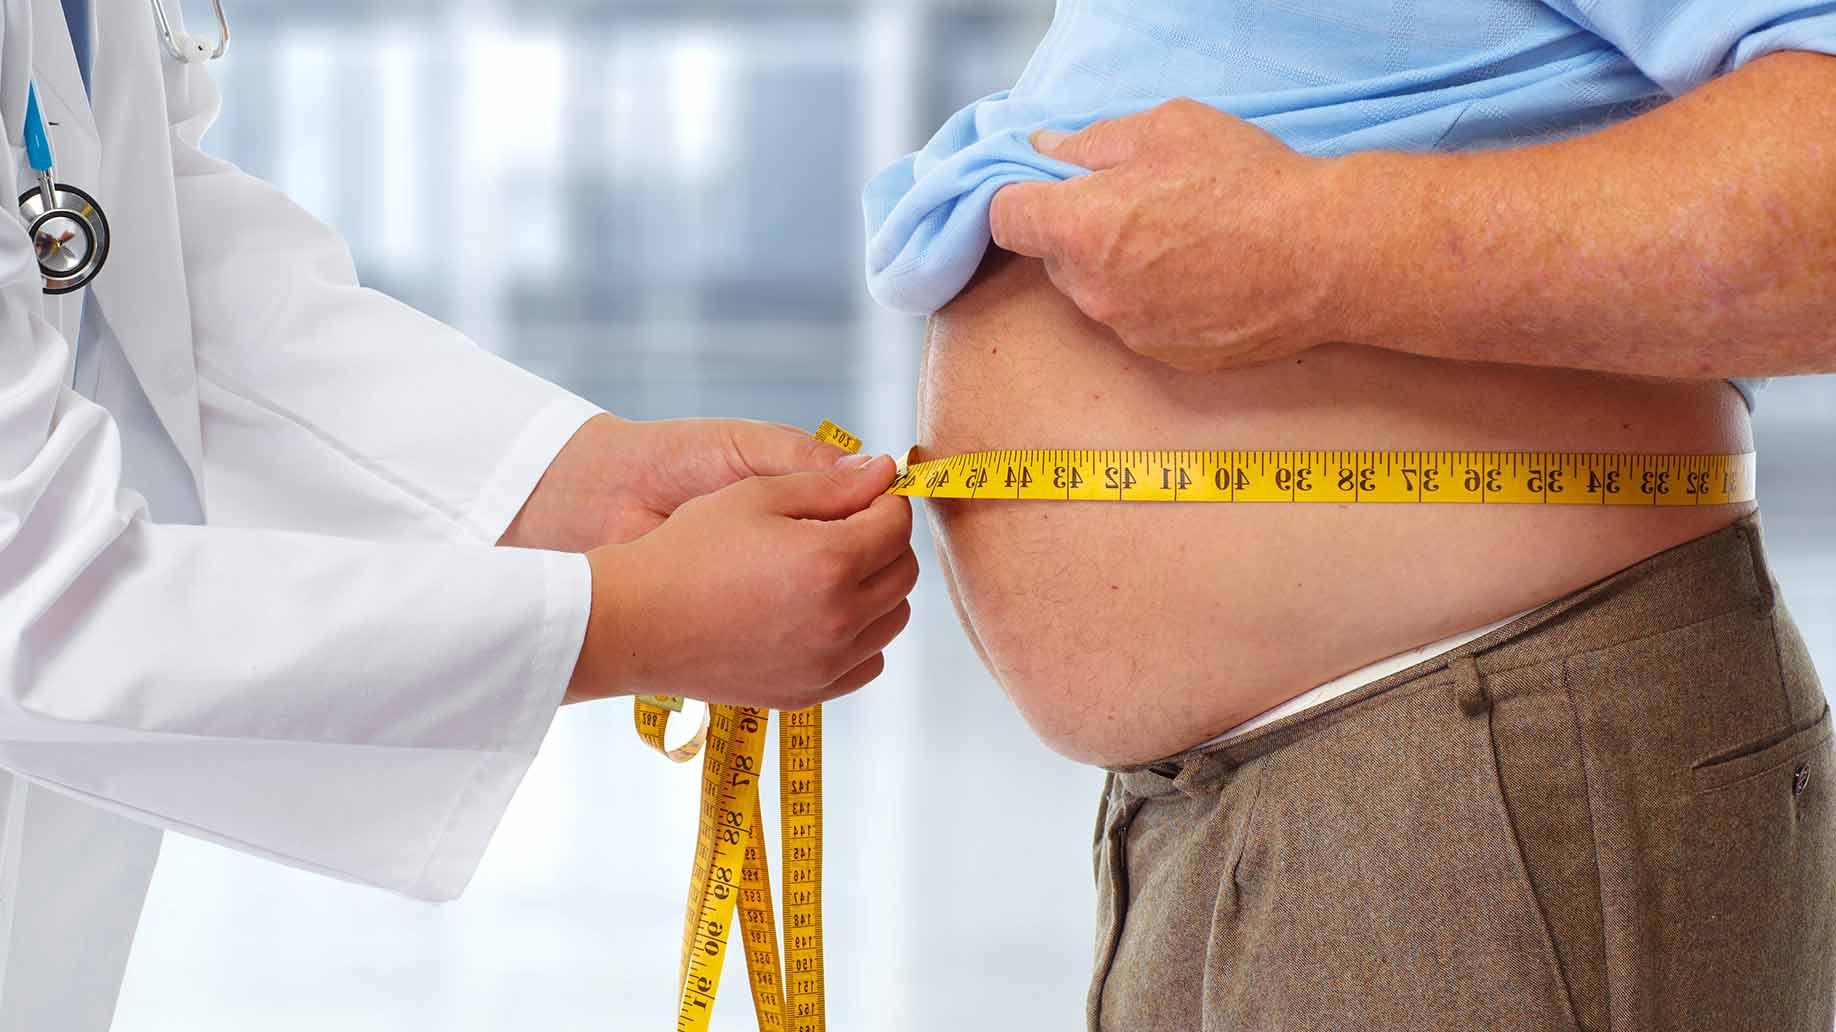 type 2 diabetes obesity vitamin c natural health benefits